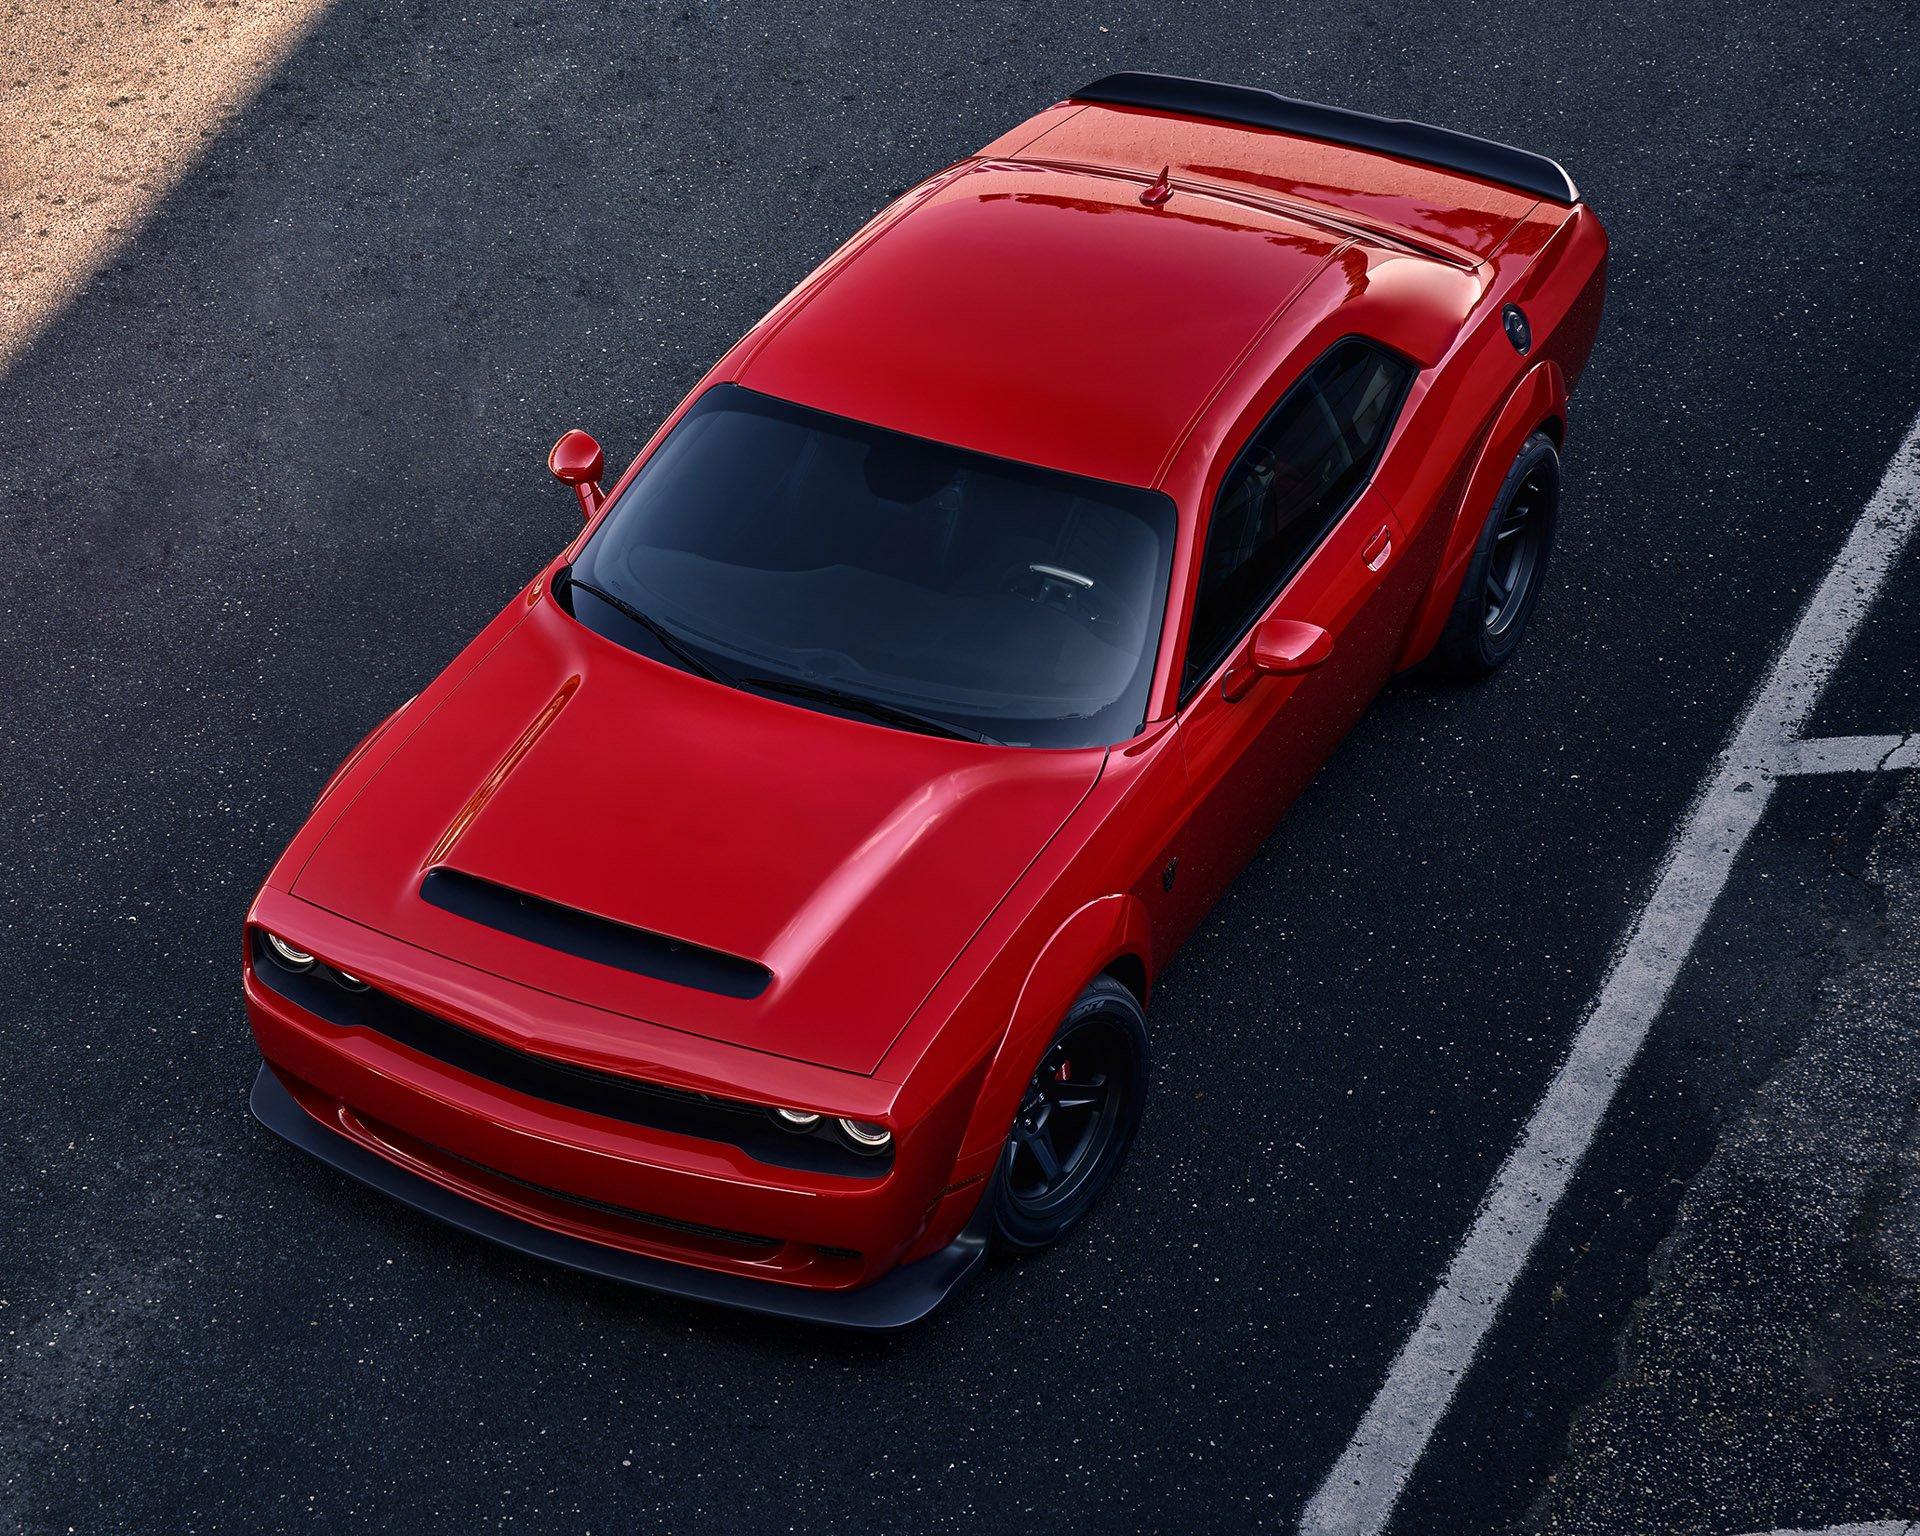 How Much Is A Dodge Demon >> 2018 Dodge Challenger SRT Demon Is a Horsepower Monster